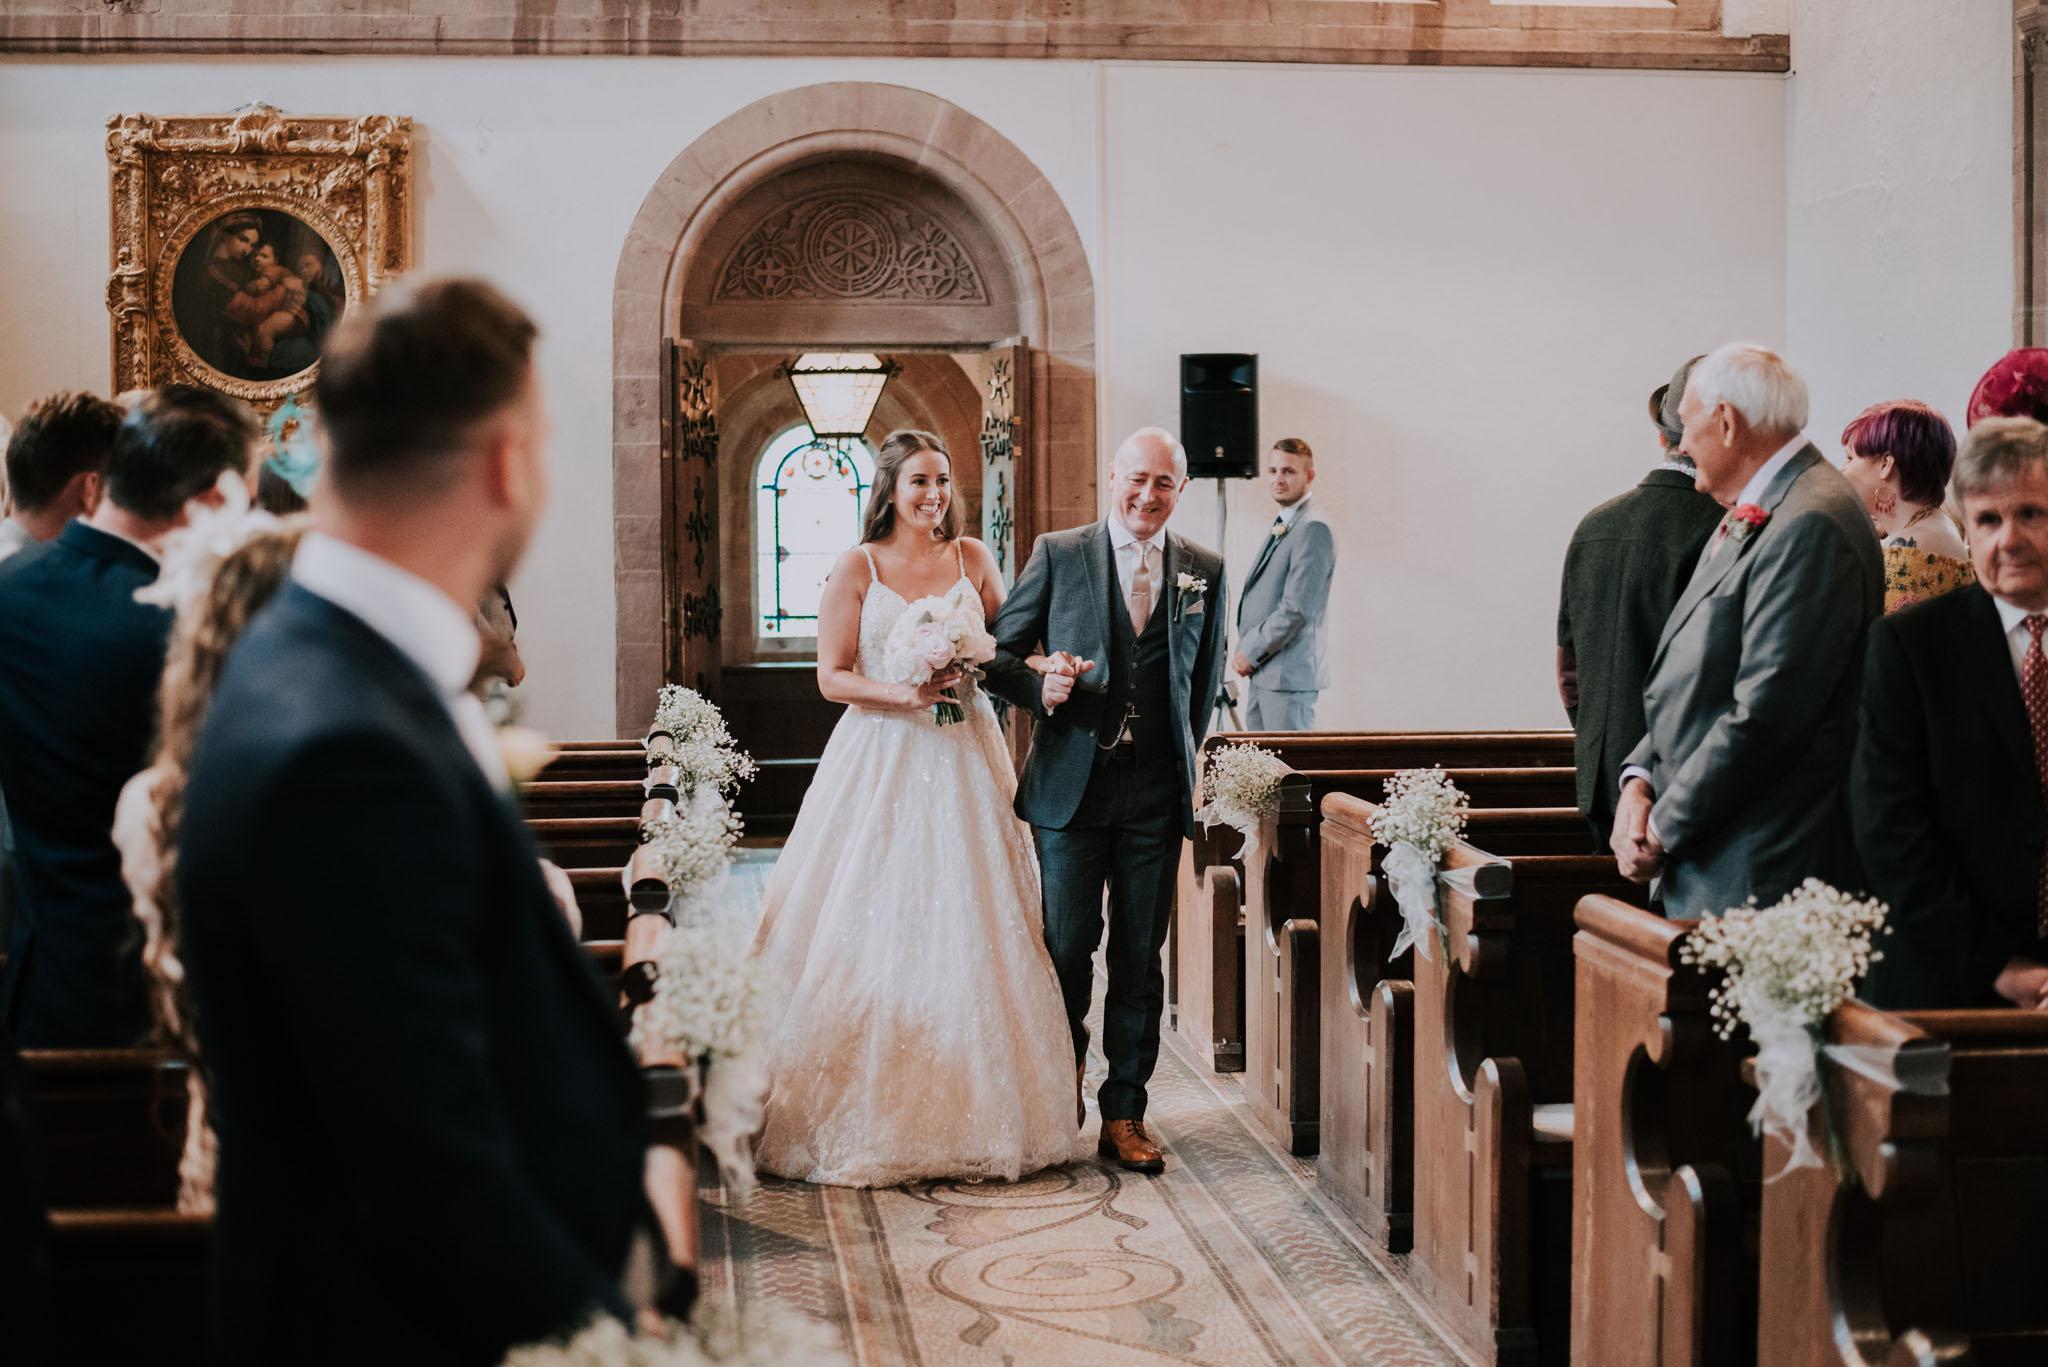 wedding-photographer-glewstone-court-hereford-scott-stockwell-photography164.jpg